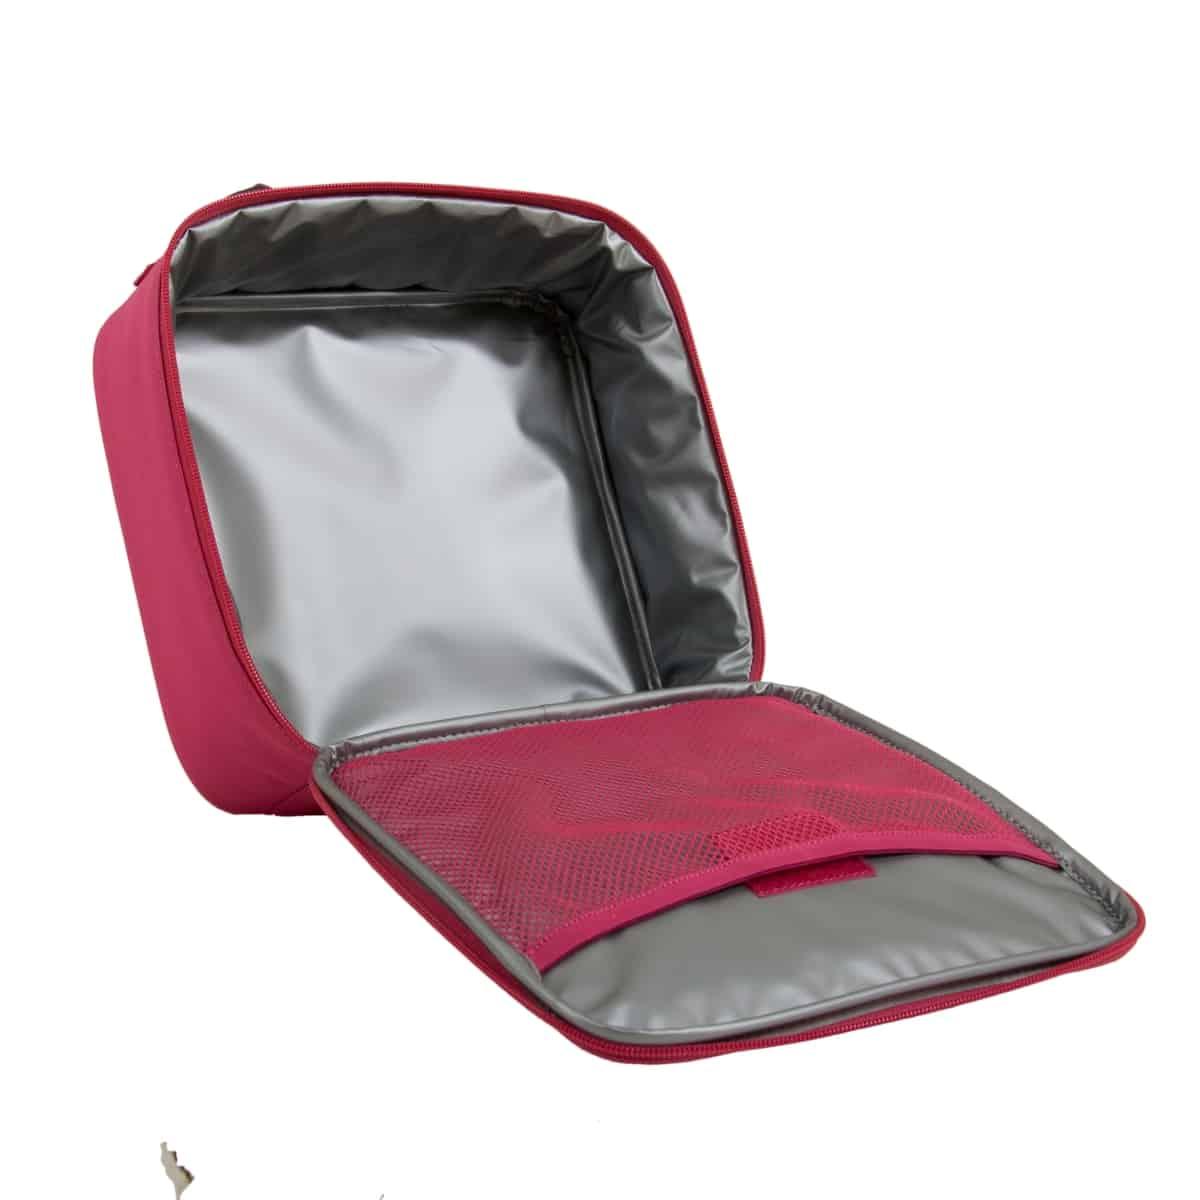 lego 5005530 brick lunch bag pink